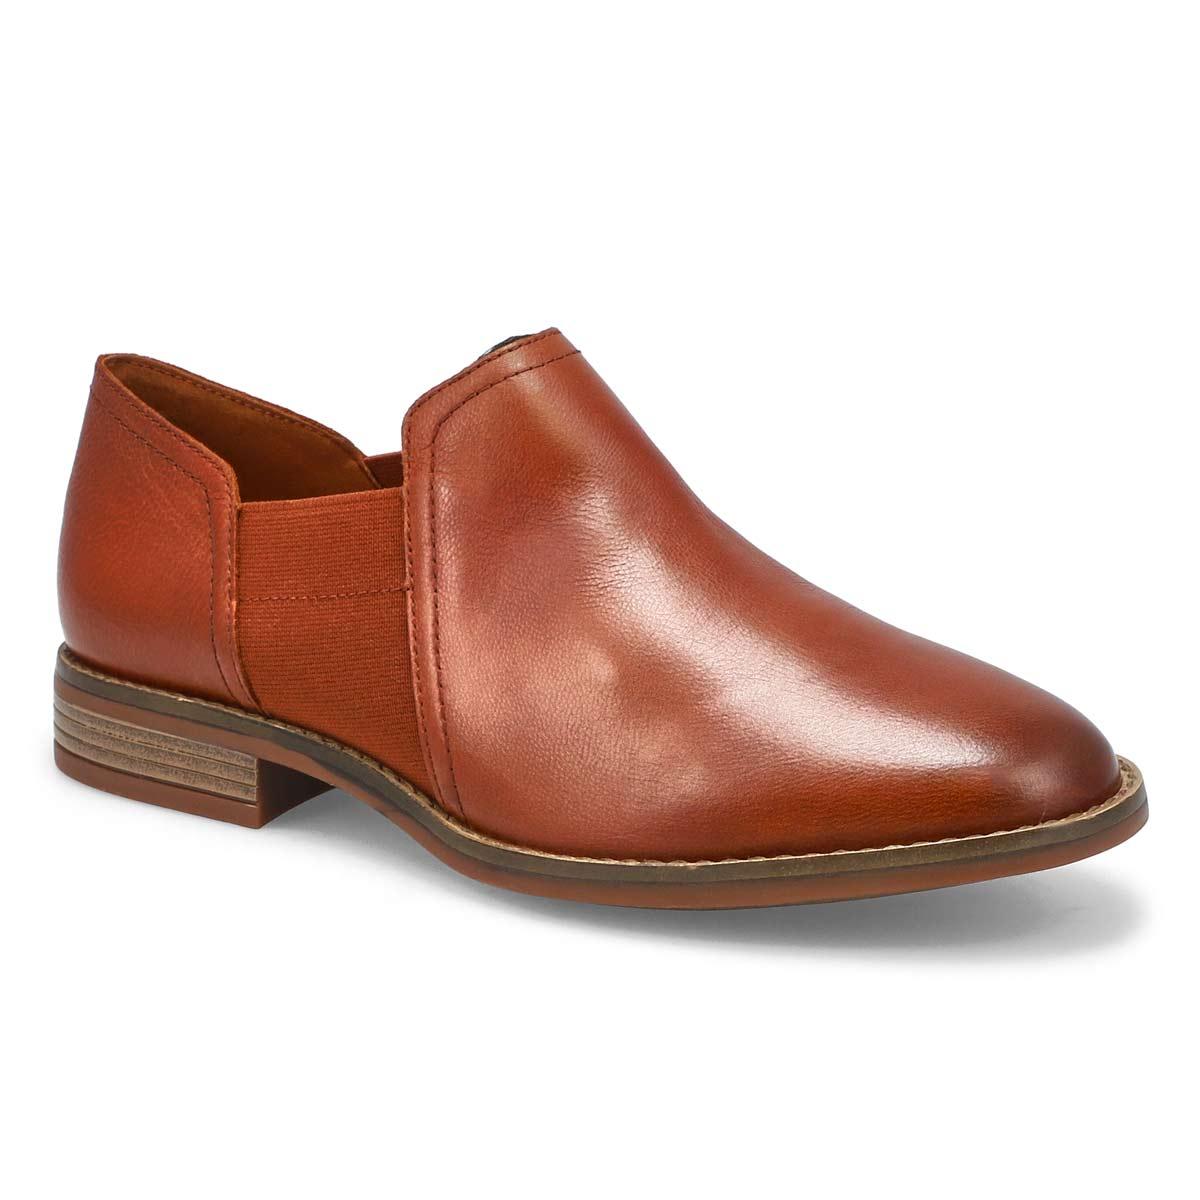 Chaussure Camzin Step, brun foncé, fem-Lrge